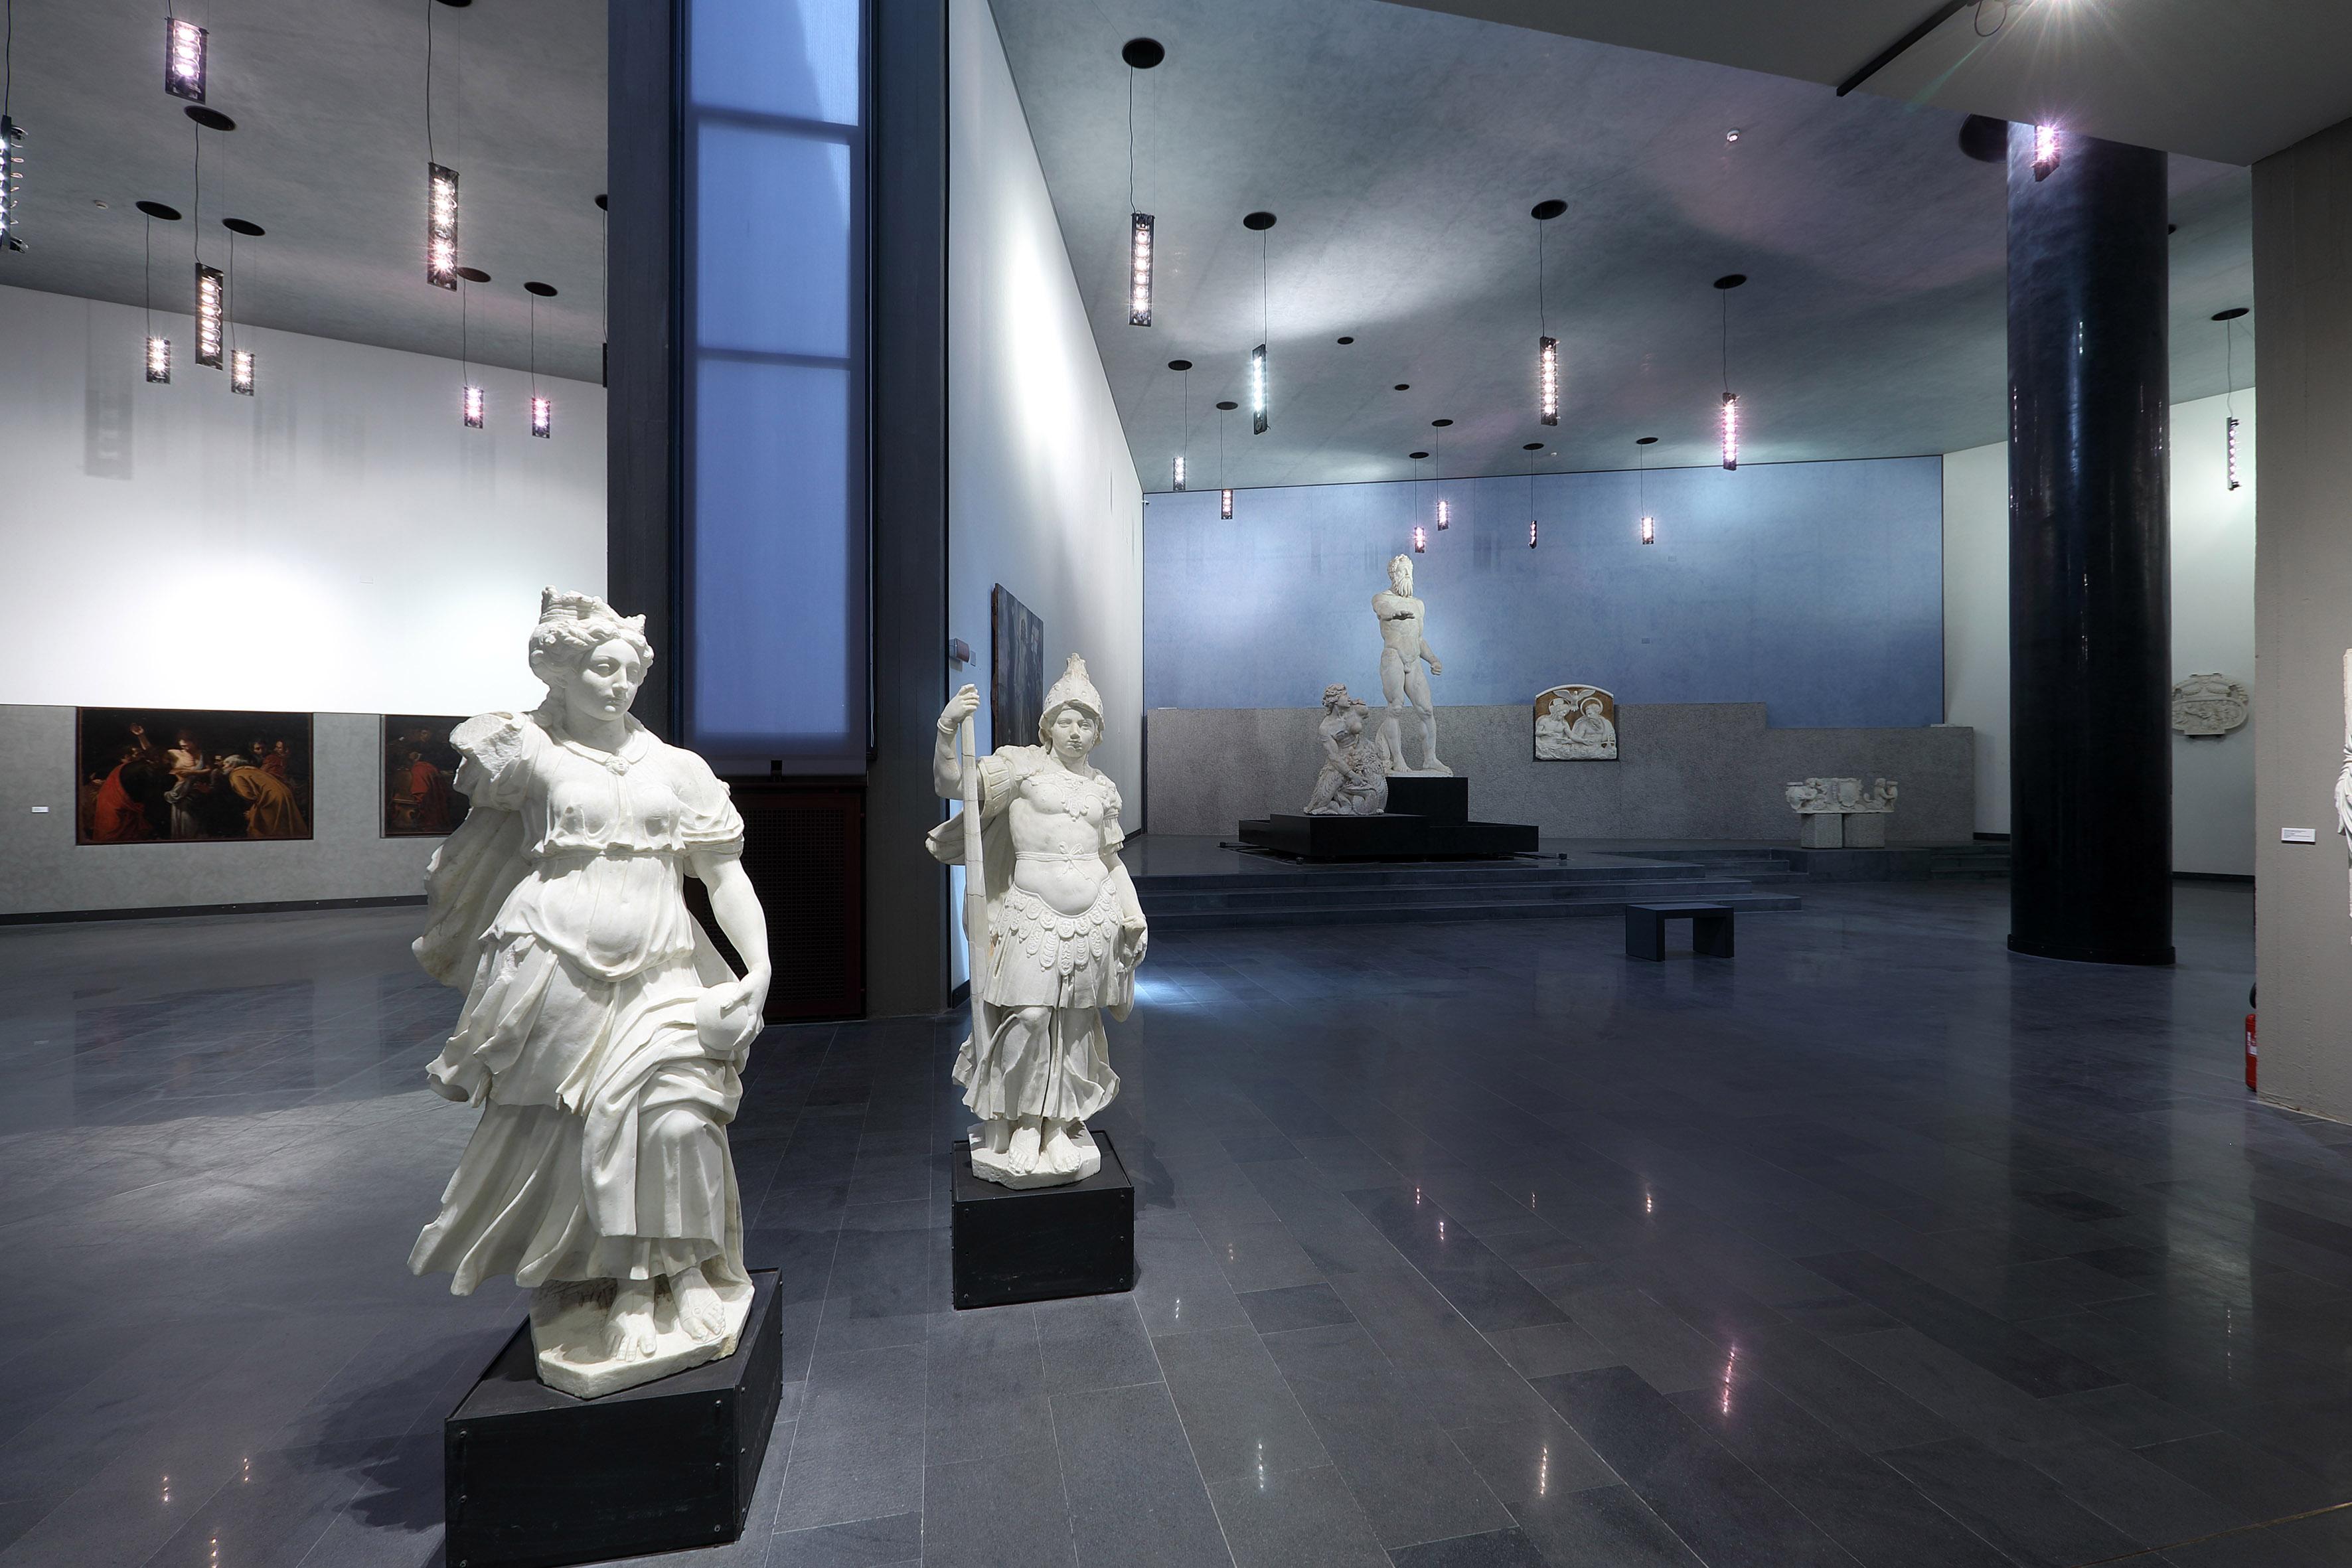 A sinistra i Caravaggeschi e Sala Montorsoli. Ph. Credit Foto Parrinello